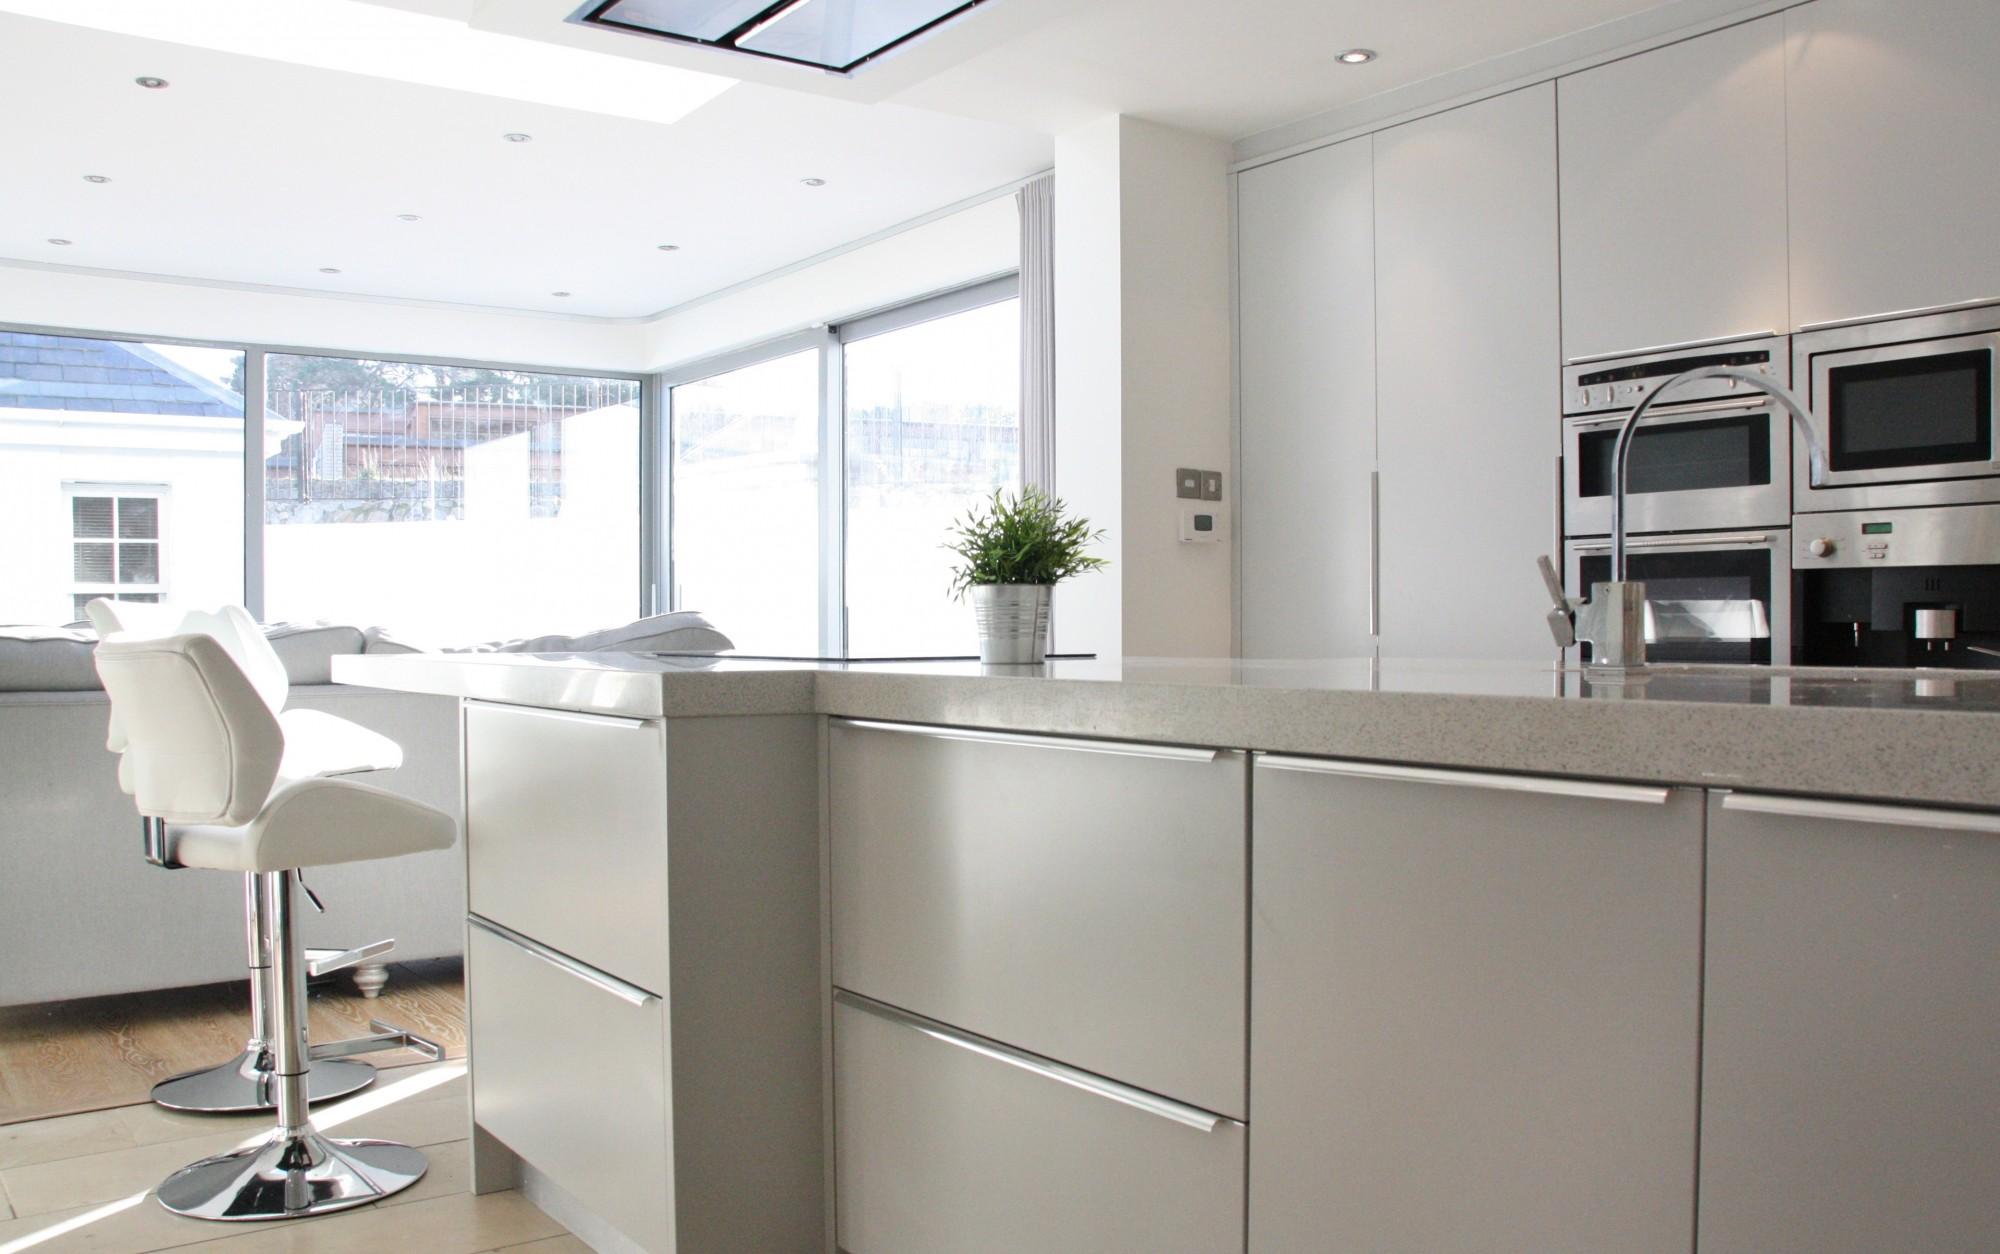 enigma design » contemporary flat panel kitchen design 5 wide